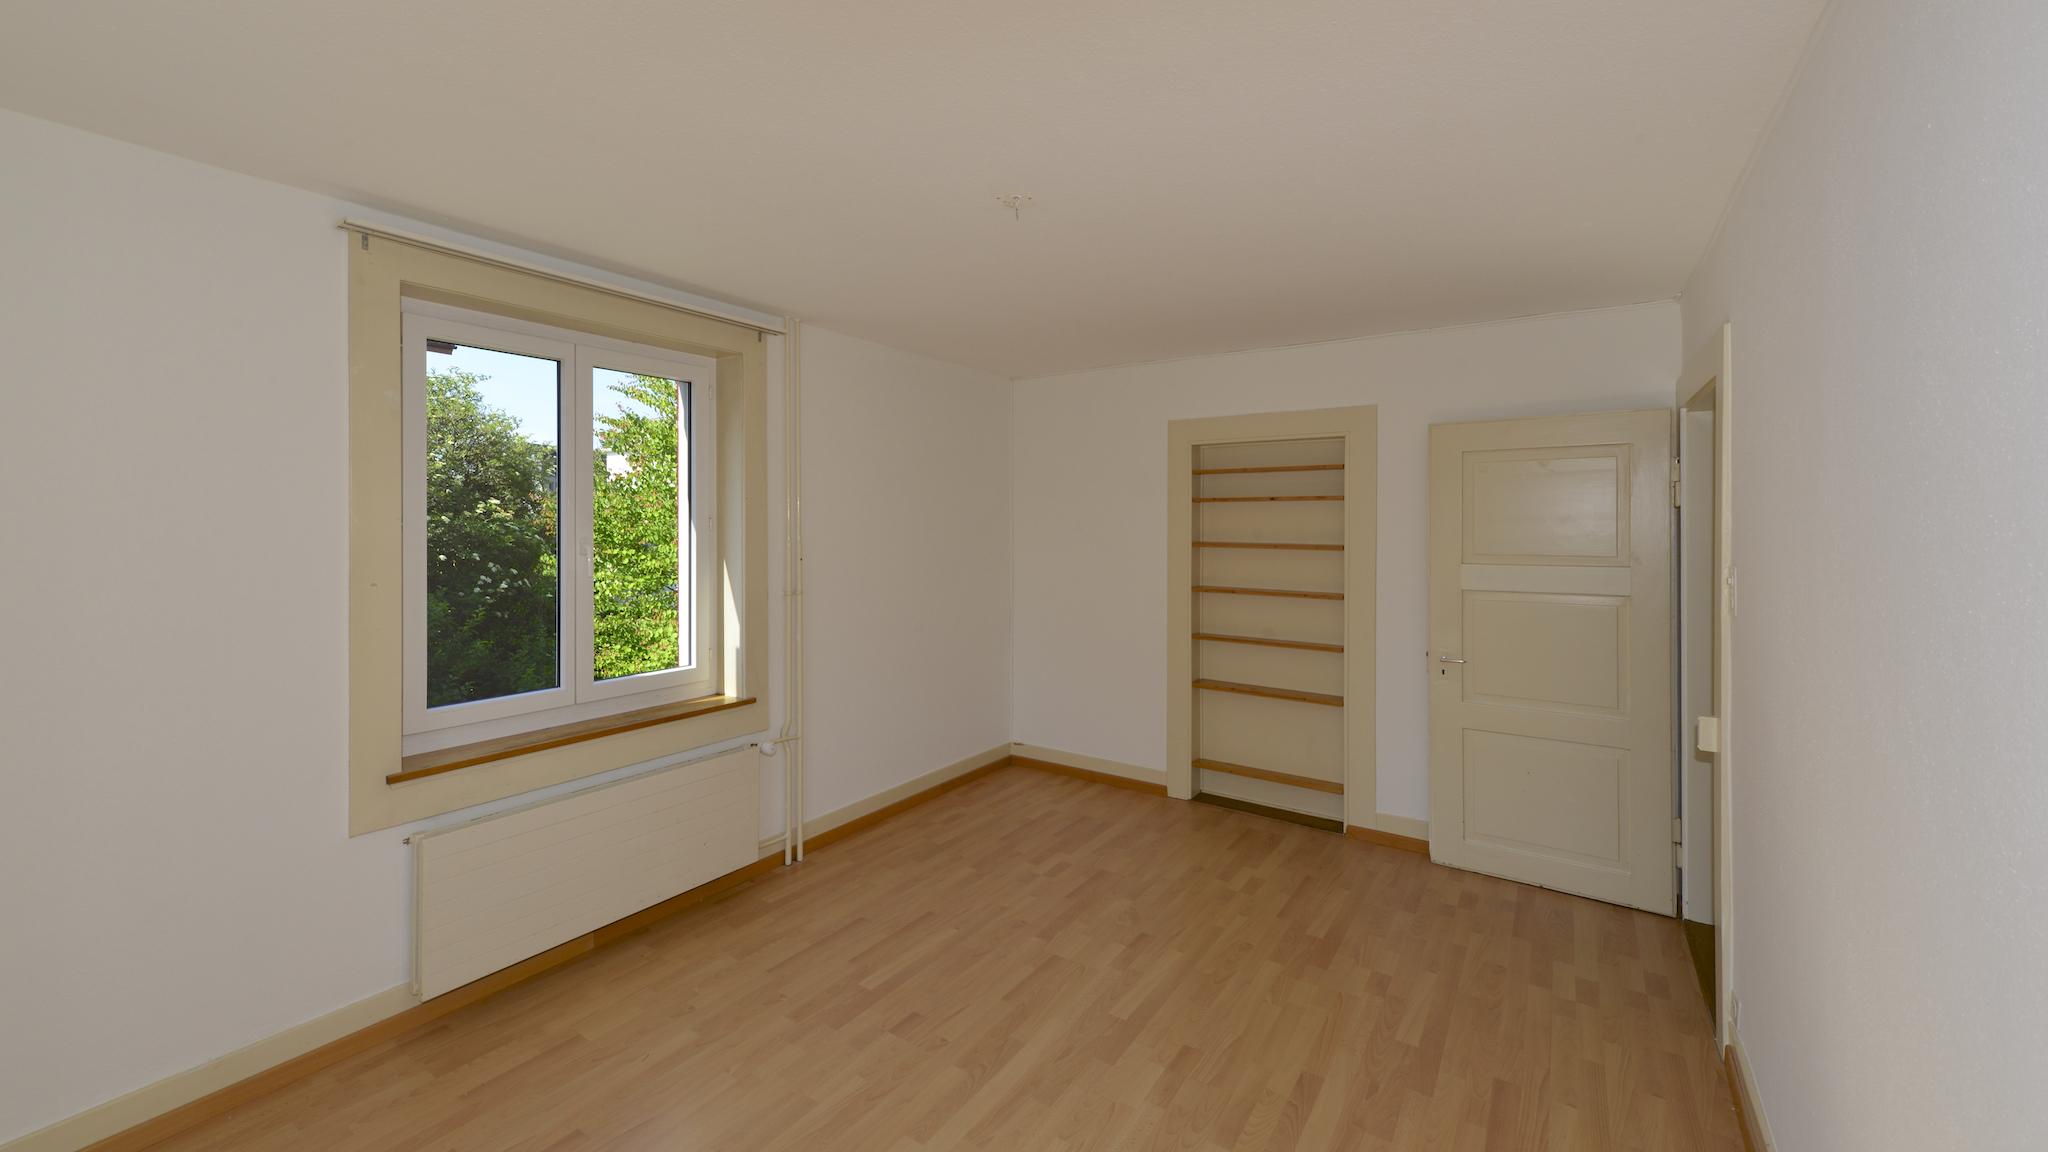 Zimmer hinten links